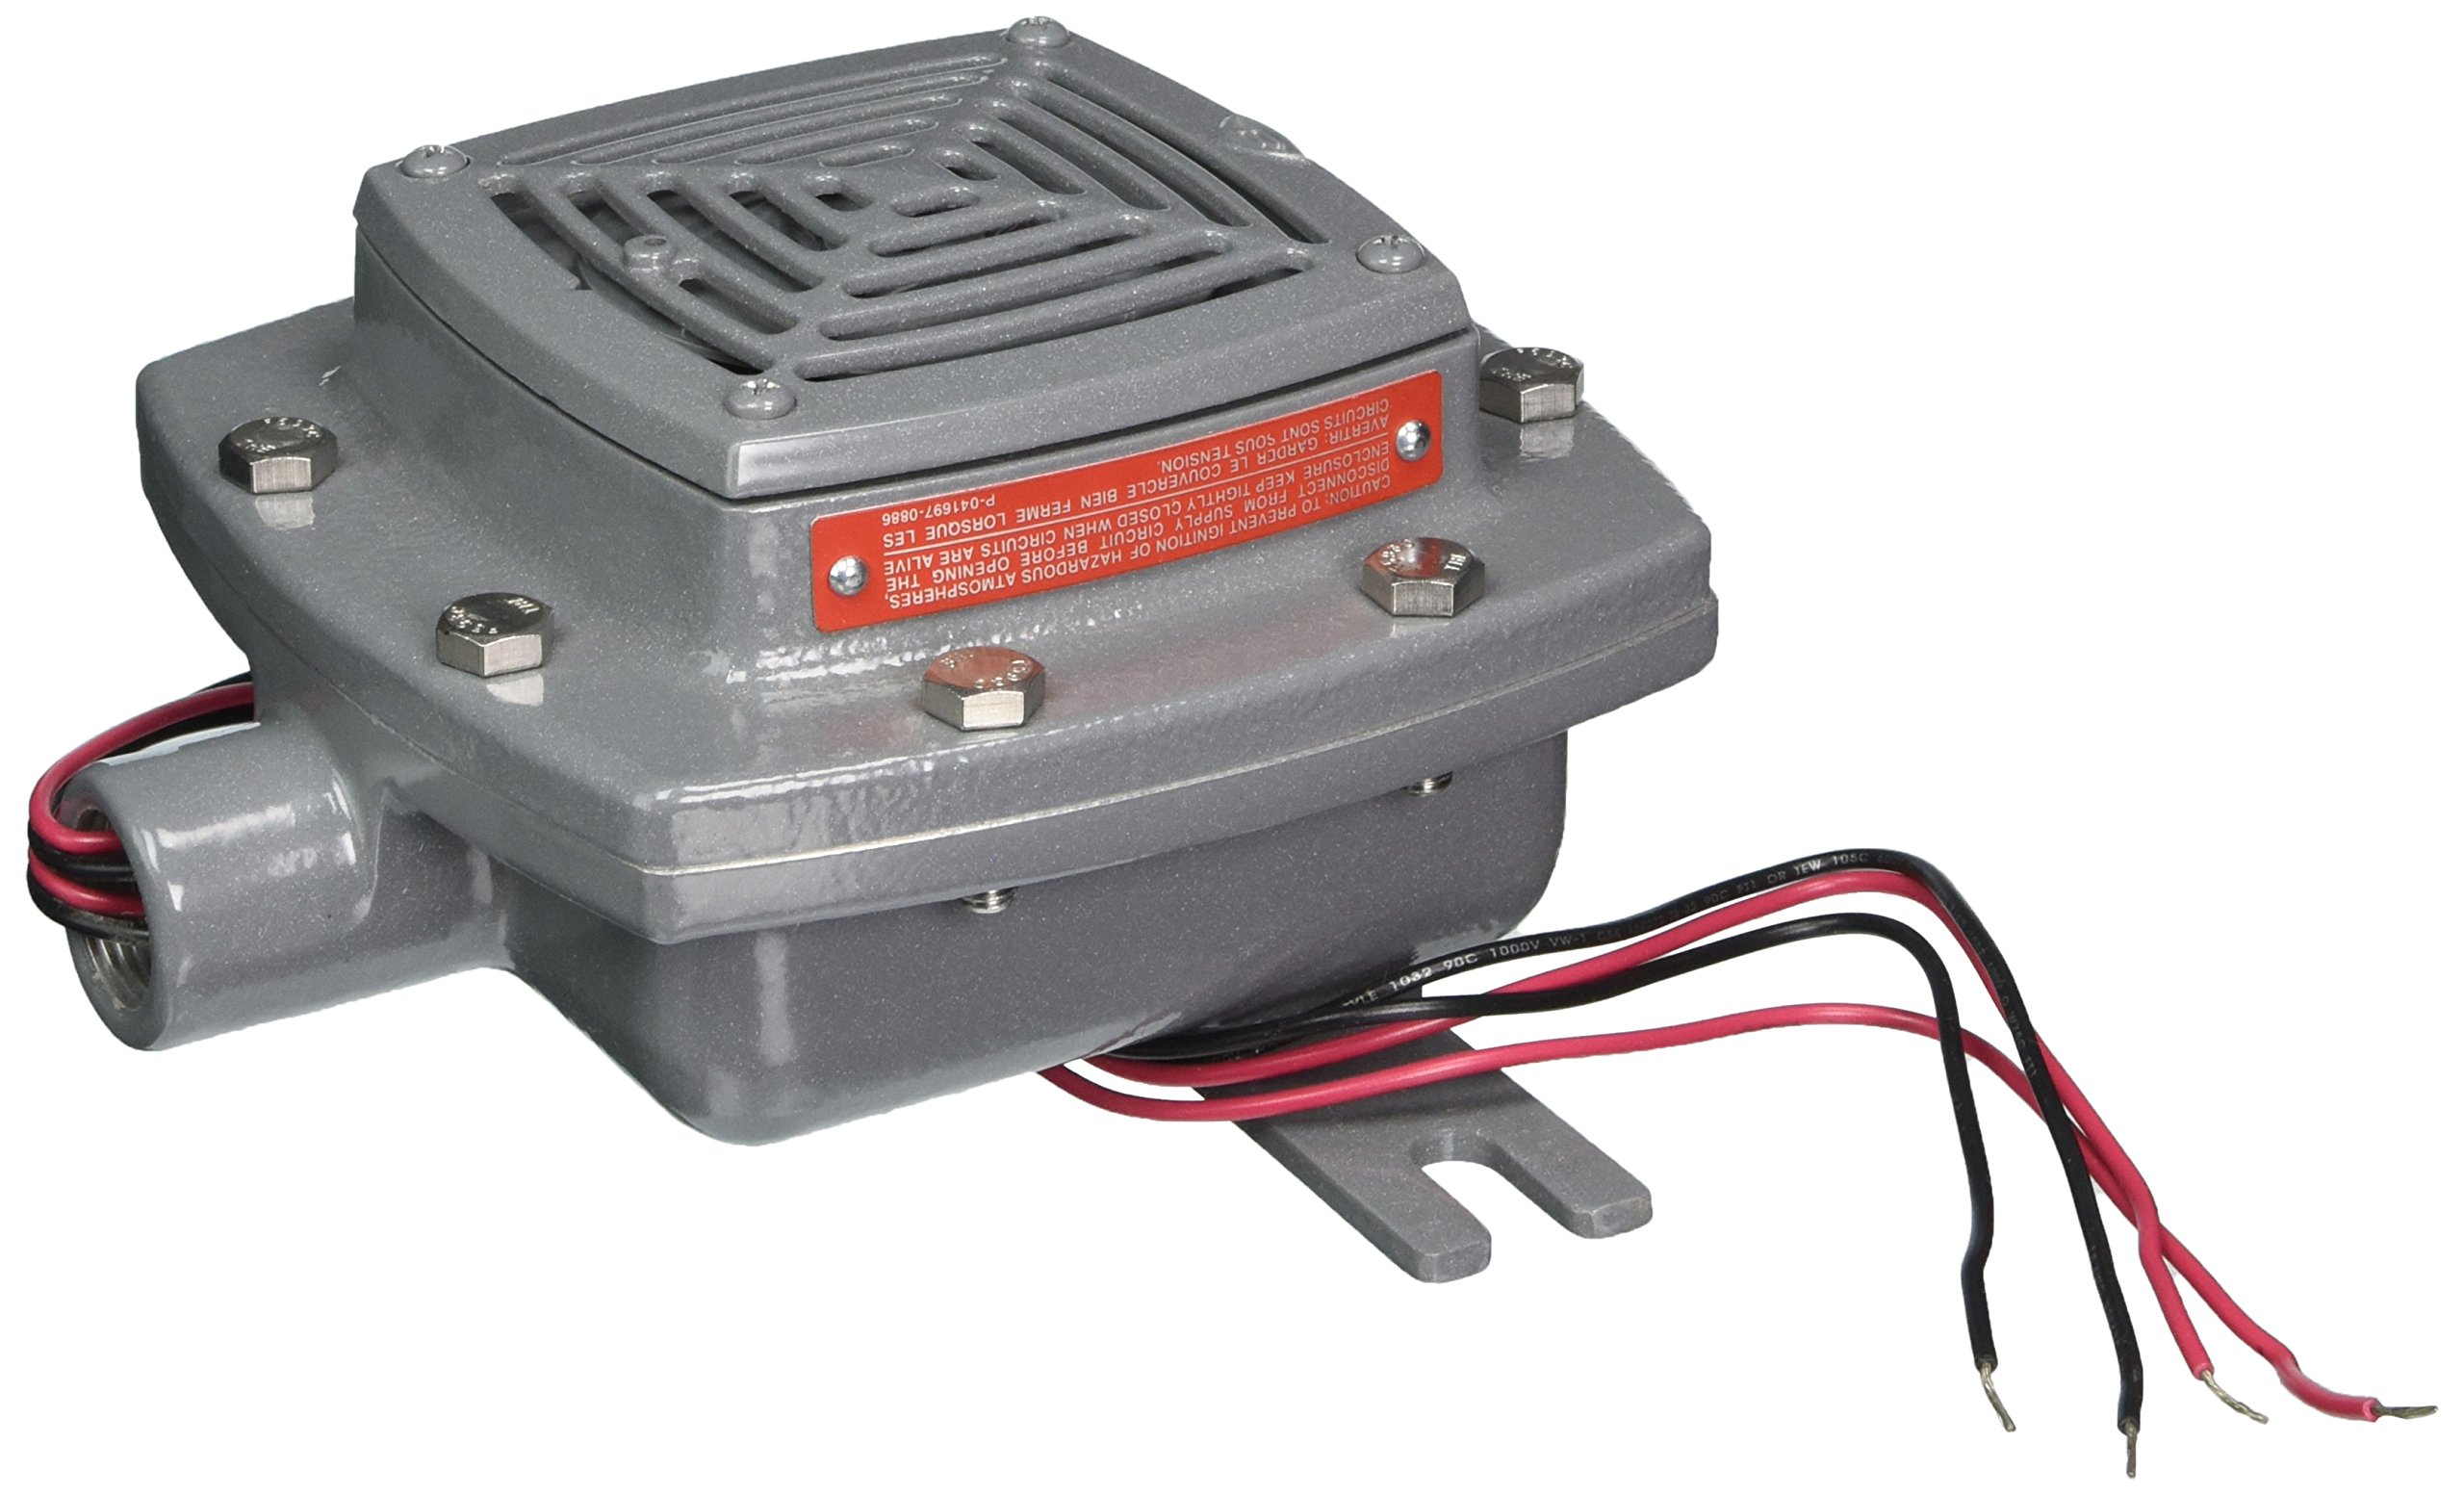 Edwards Signaling 879DEX-G1 Diode Polarized Vibrating Horn, 107/97 db, 24V DC, Gray